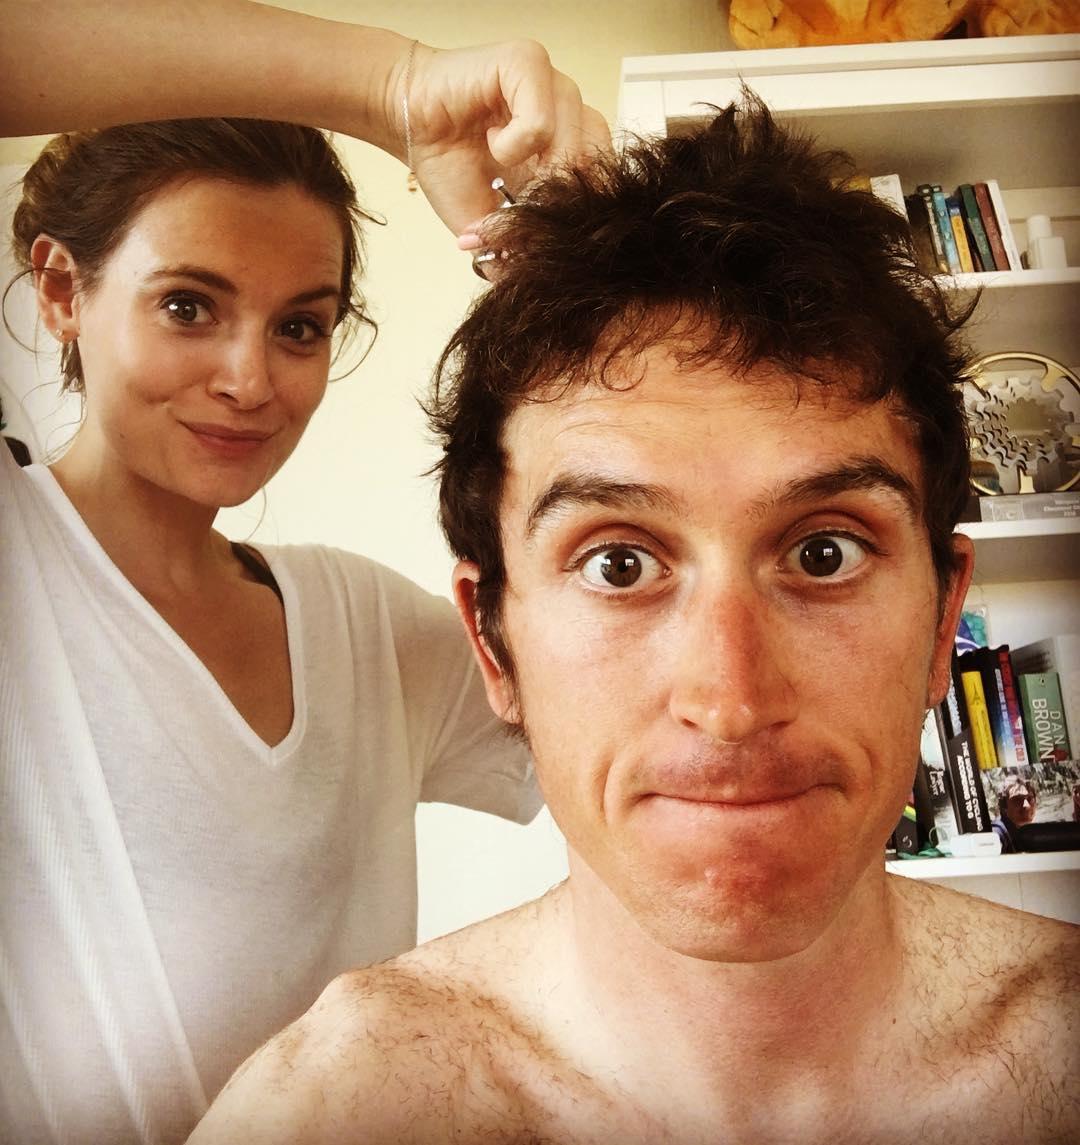 Geraint Thomas is married to TV presenter Sara Elen